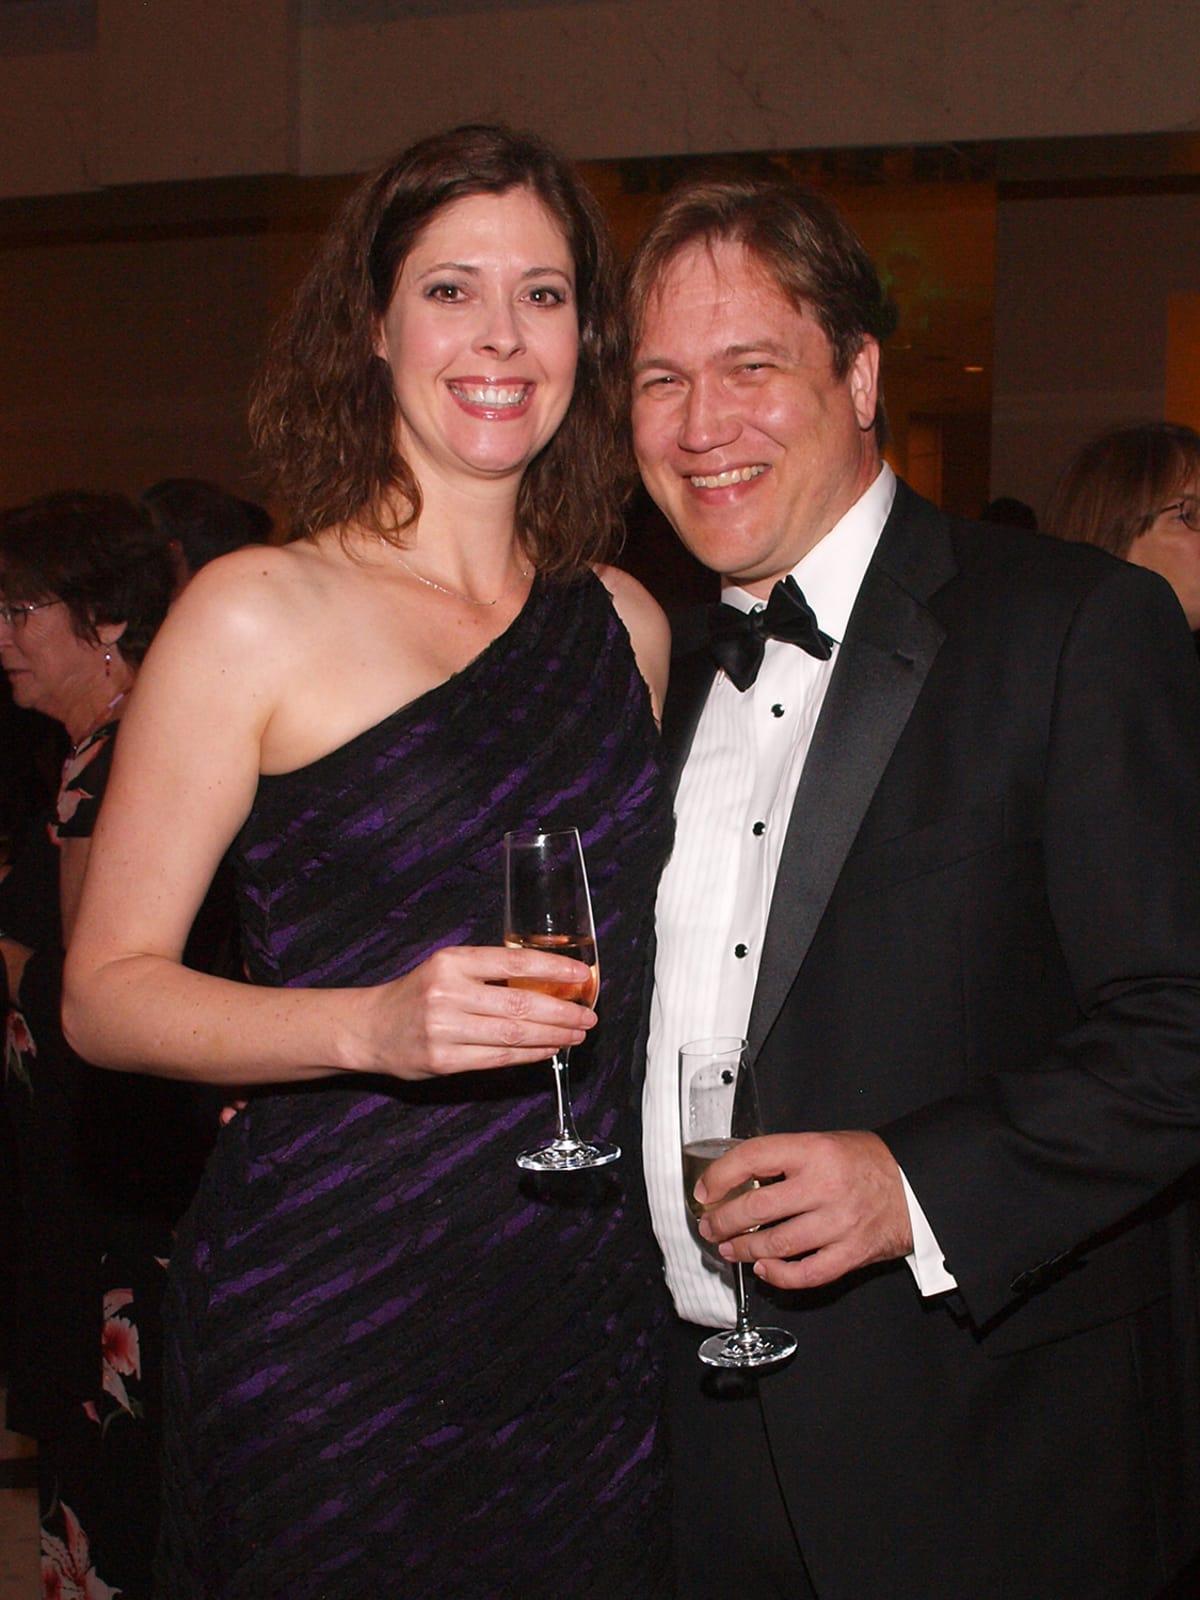 Welch Foundation banquet Christy Landes, Stephan Link